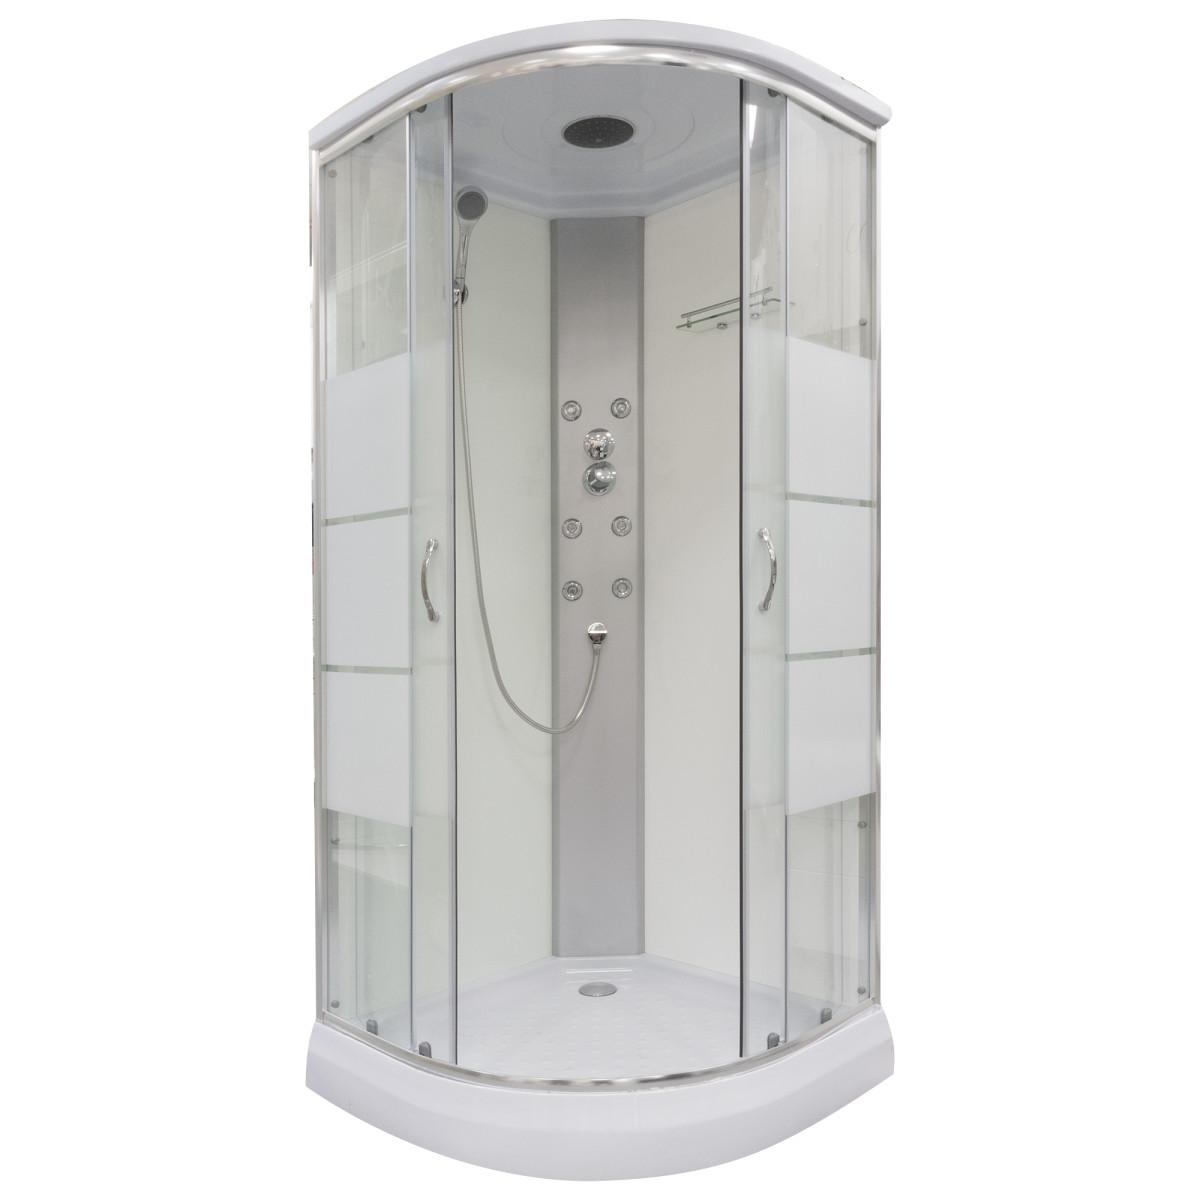 Душевая кабина Sensea Noa низкий поддон 90х90 см